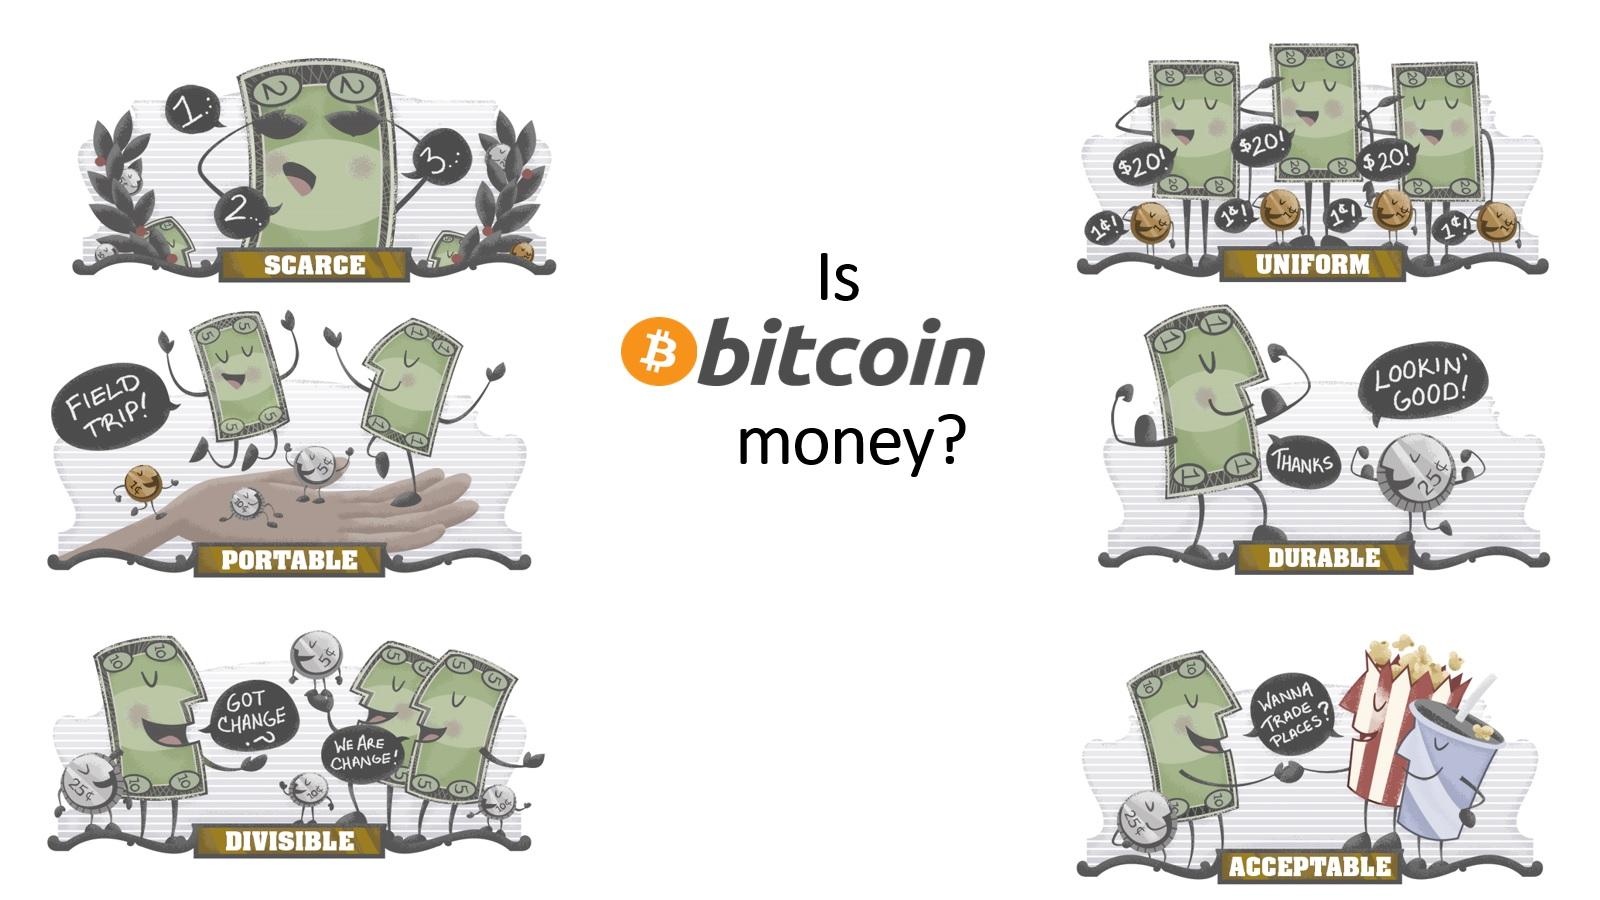 isBitcoinMoney